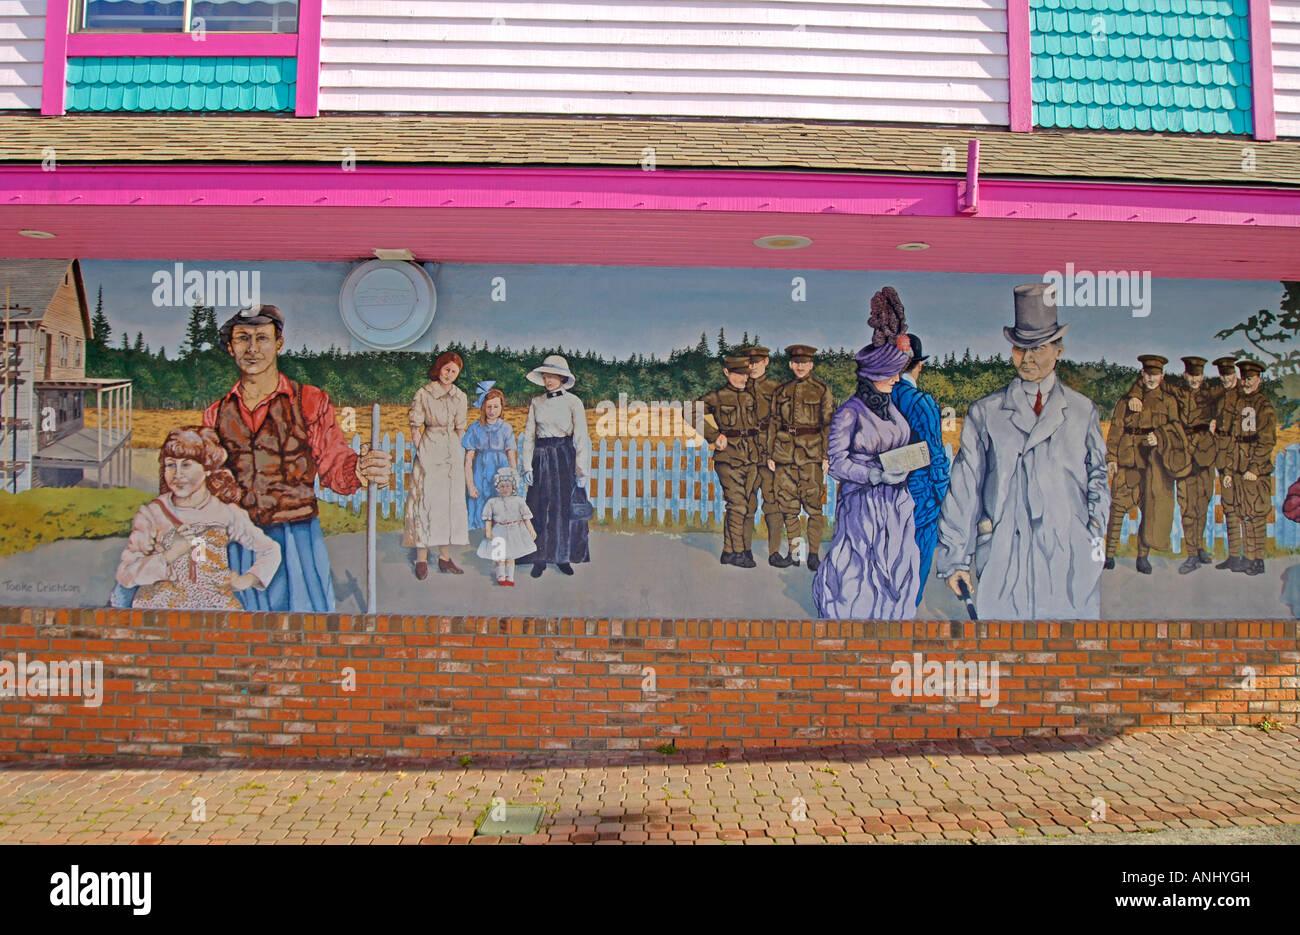 Chemainus creative outdoor wall mural the war years circa 1915 chemainus creative outdoor wall mural the war years circa 1915 painted in 1989 by susan tooke crichton halifax nova scotia amipublicfo Choice Image